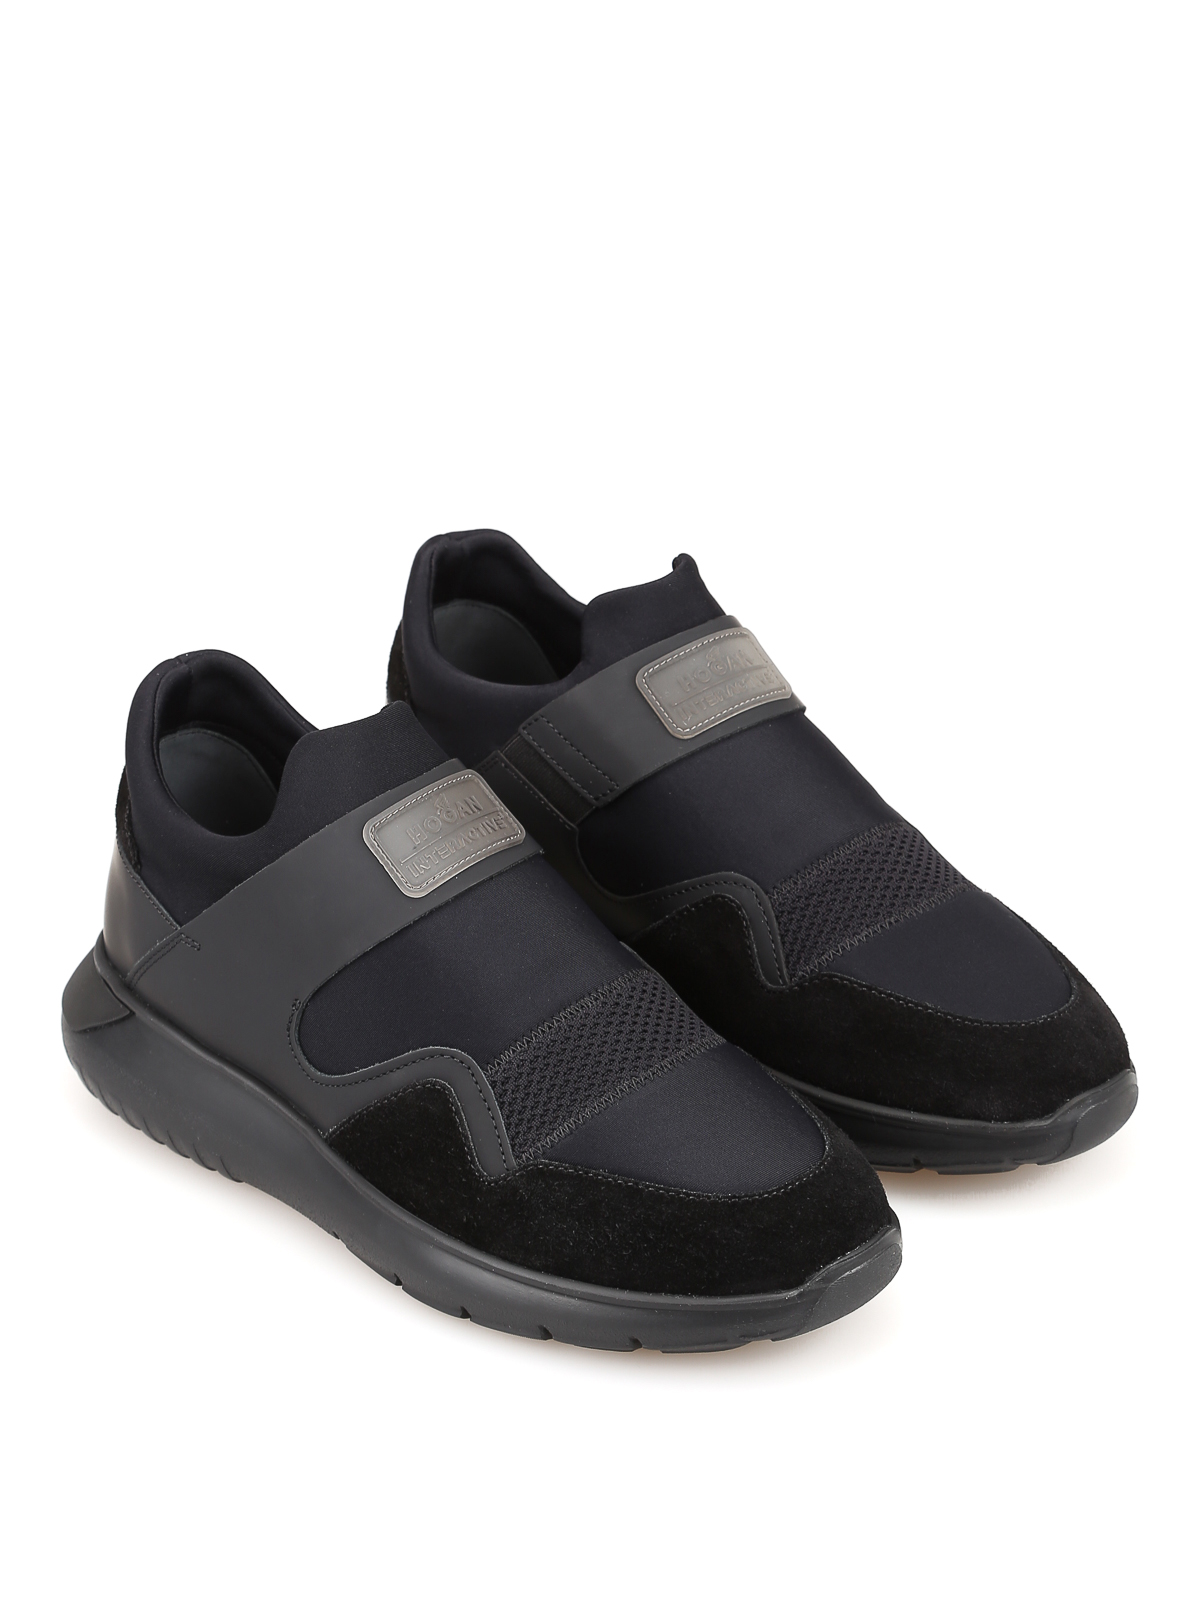 H371 Interactive³ slip-on sneakers HOGAN | 12 | HXM3710BX40LMXB999